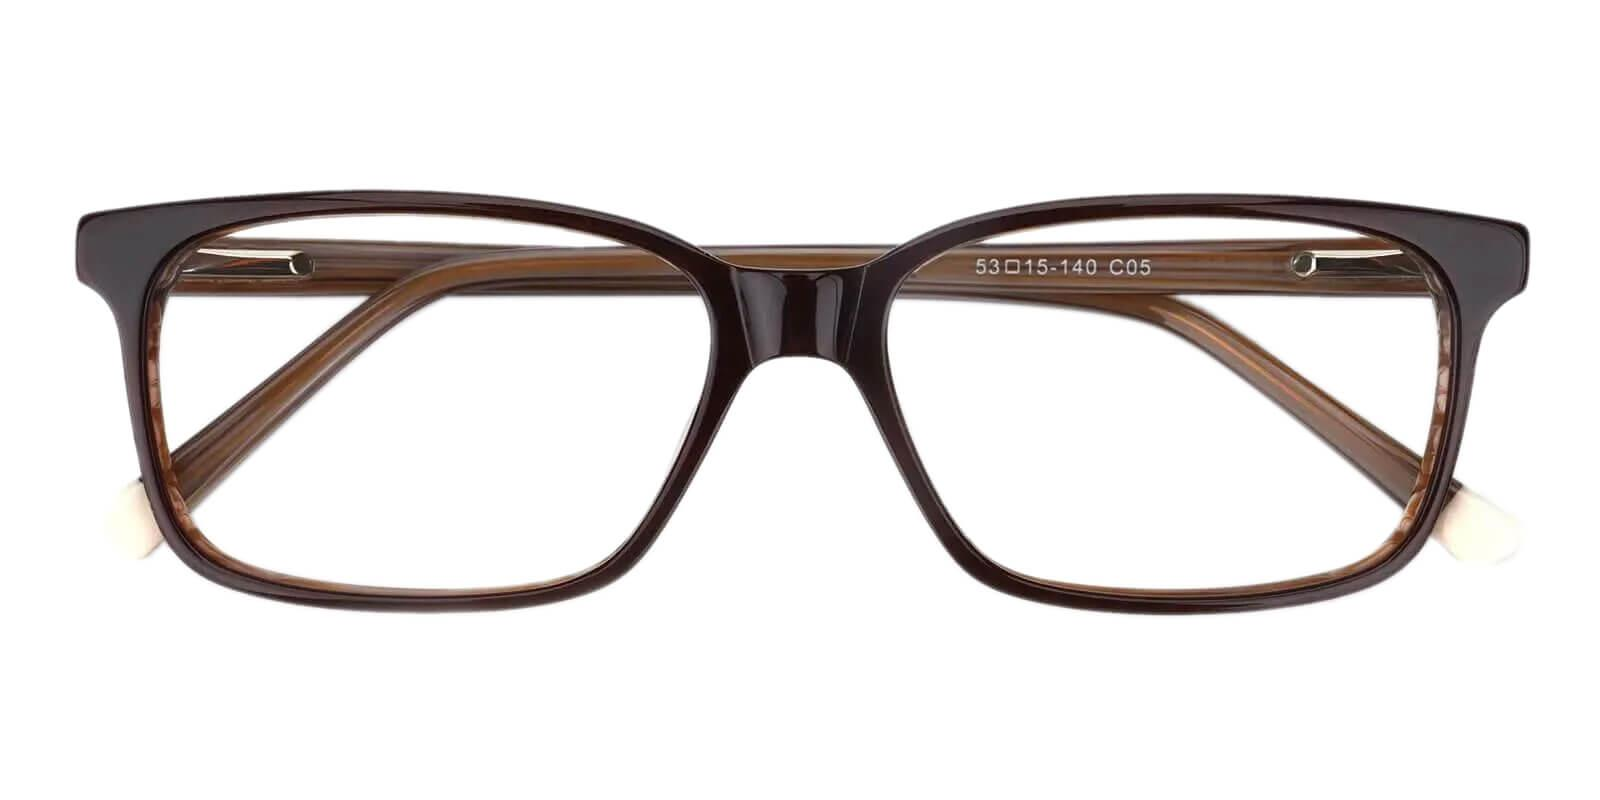 Lochloosa Striped Acetate Eyeglasses , SpringHinges , UniversalBridgeFit Frames from ABBE Glasses